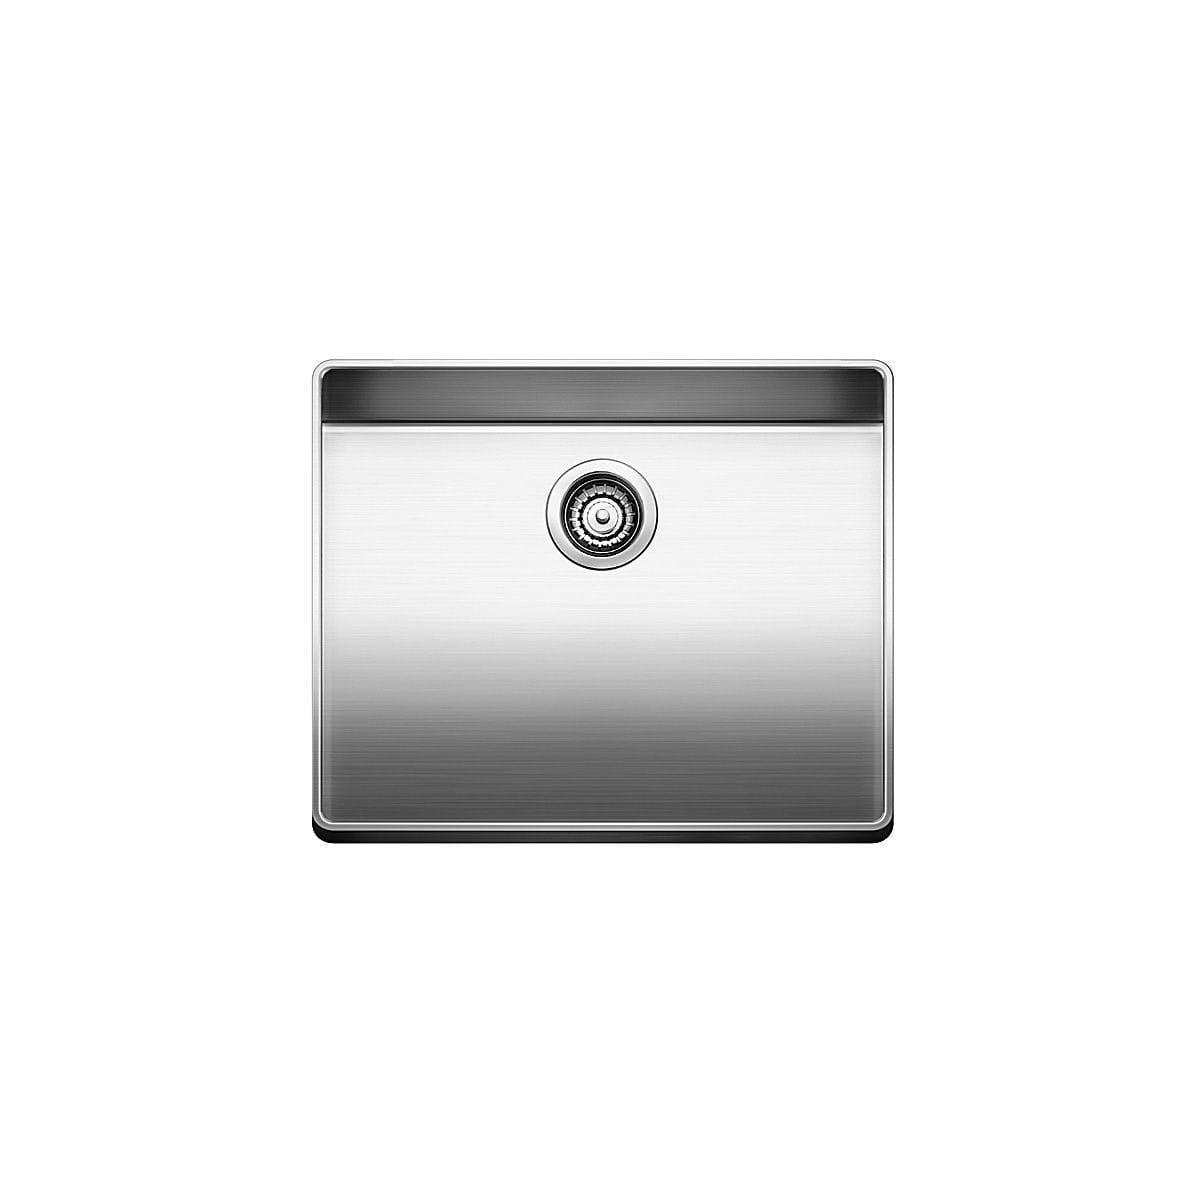 "Blanco Attika 19-3/4"" Single Bowl Drop In Stainless Steel Kitchen Sink"